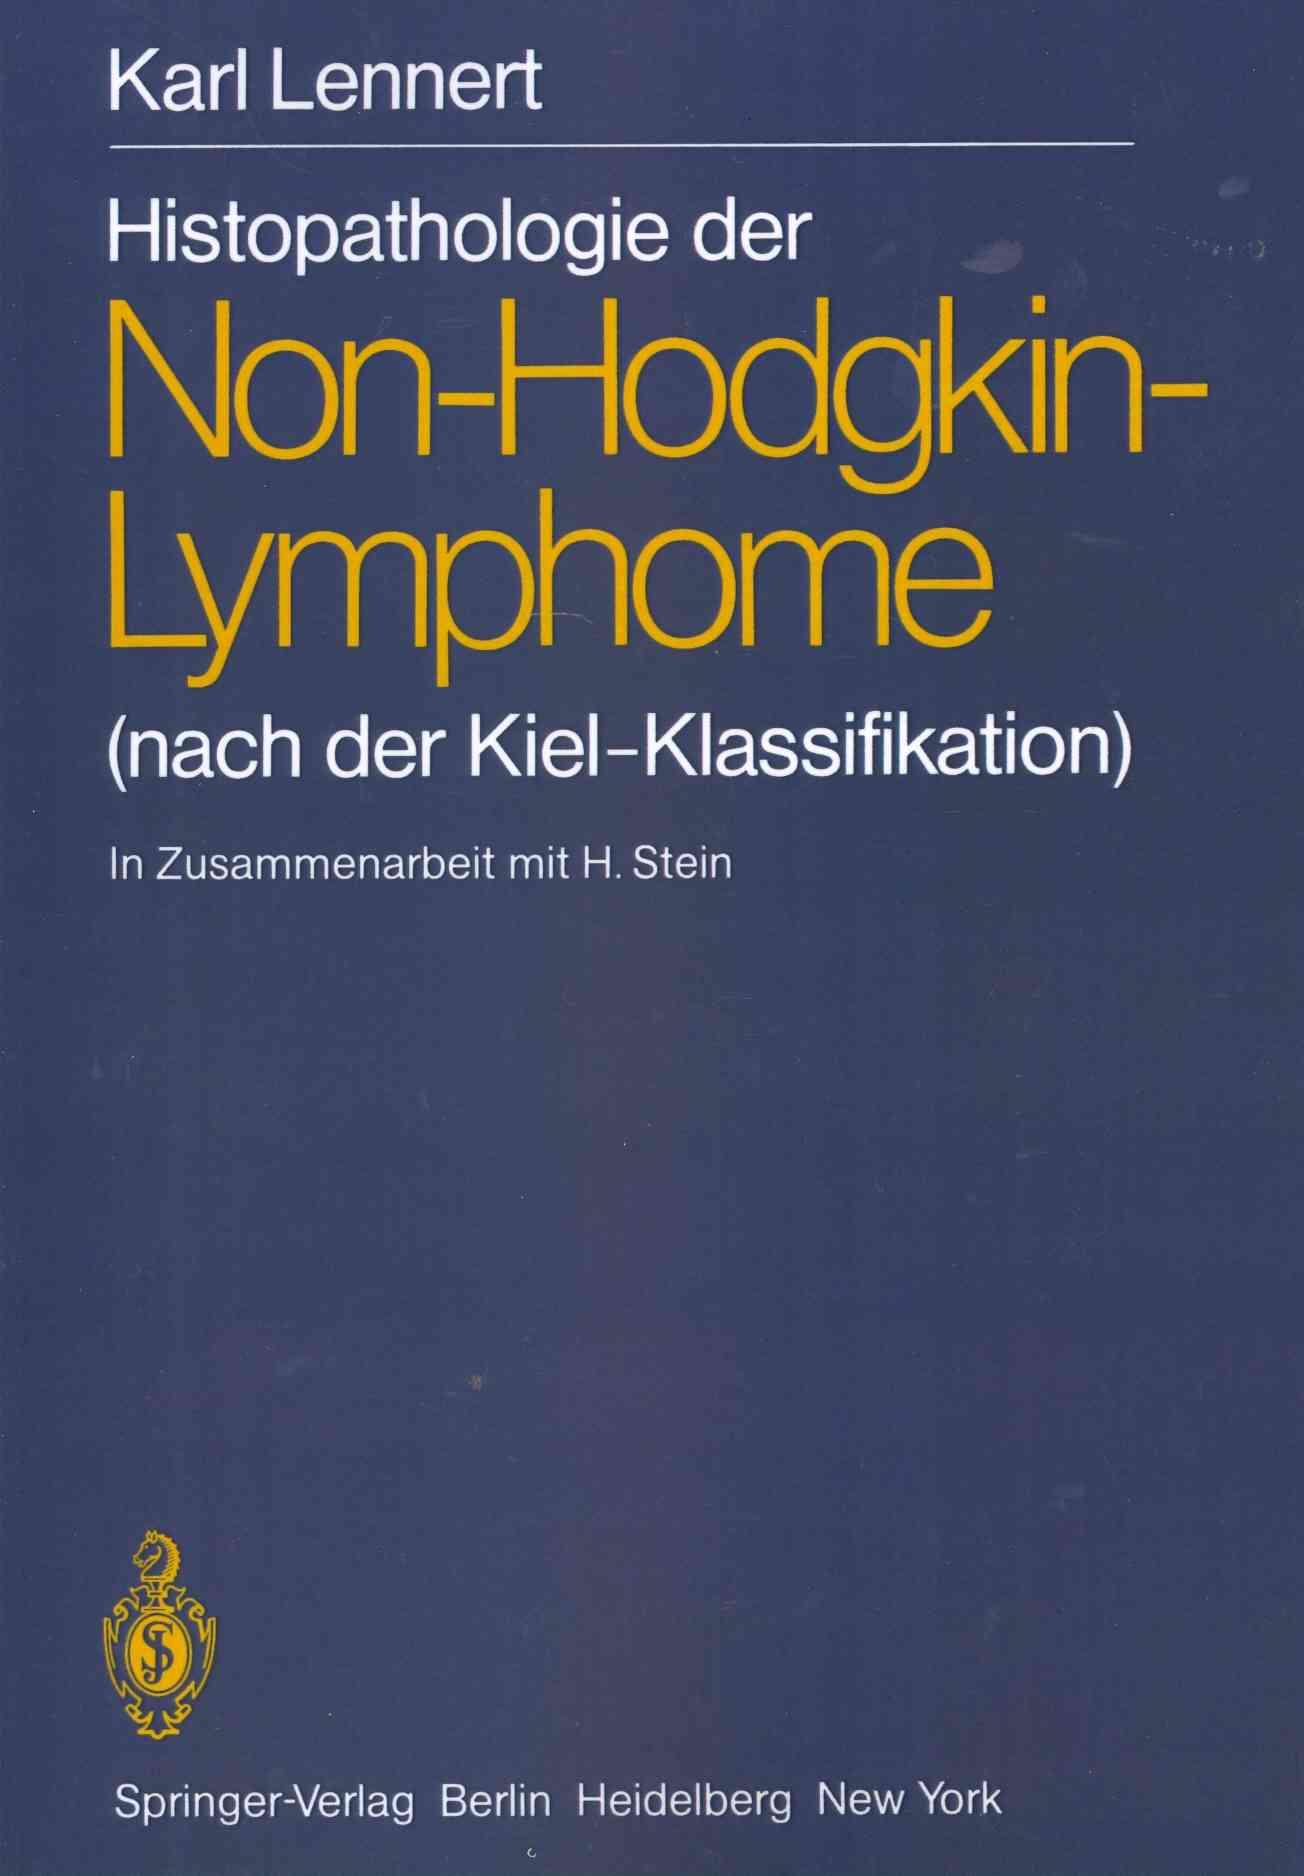 Histopathologie Der Non-hodgkin-lymphome By Paulli, M. (CON)/ Le Tourneau, A. (CON)/ Stein, H. (CON)/ Feller, Alfred C./ Lennert, K.